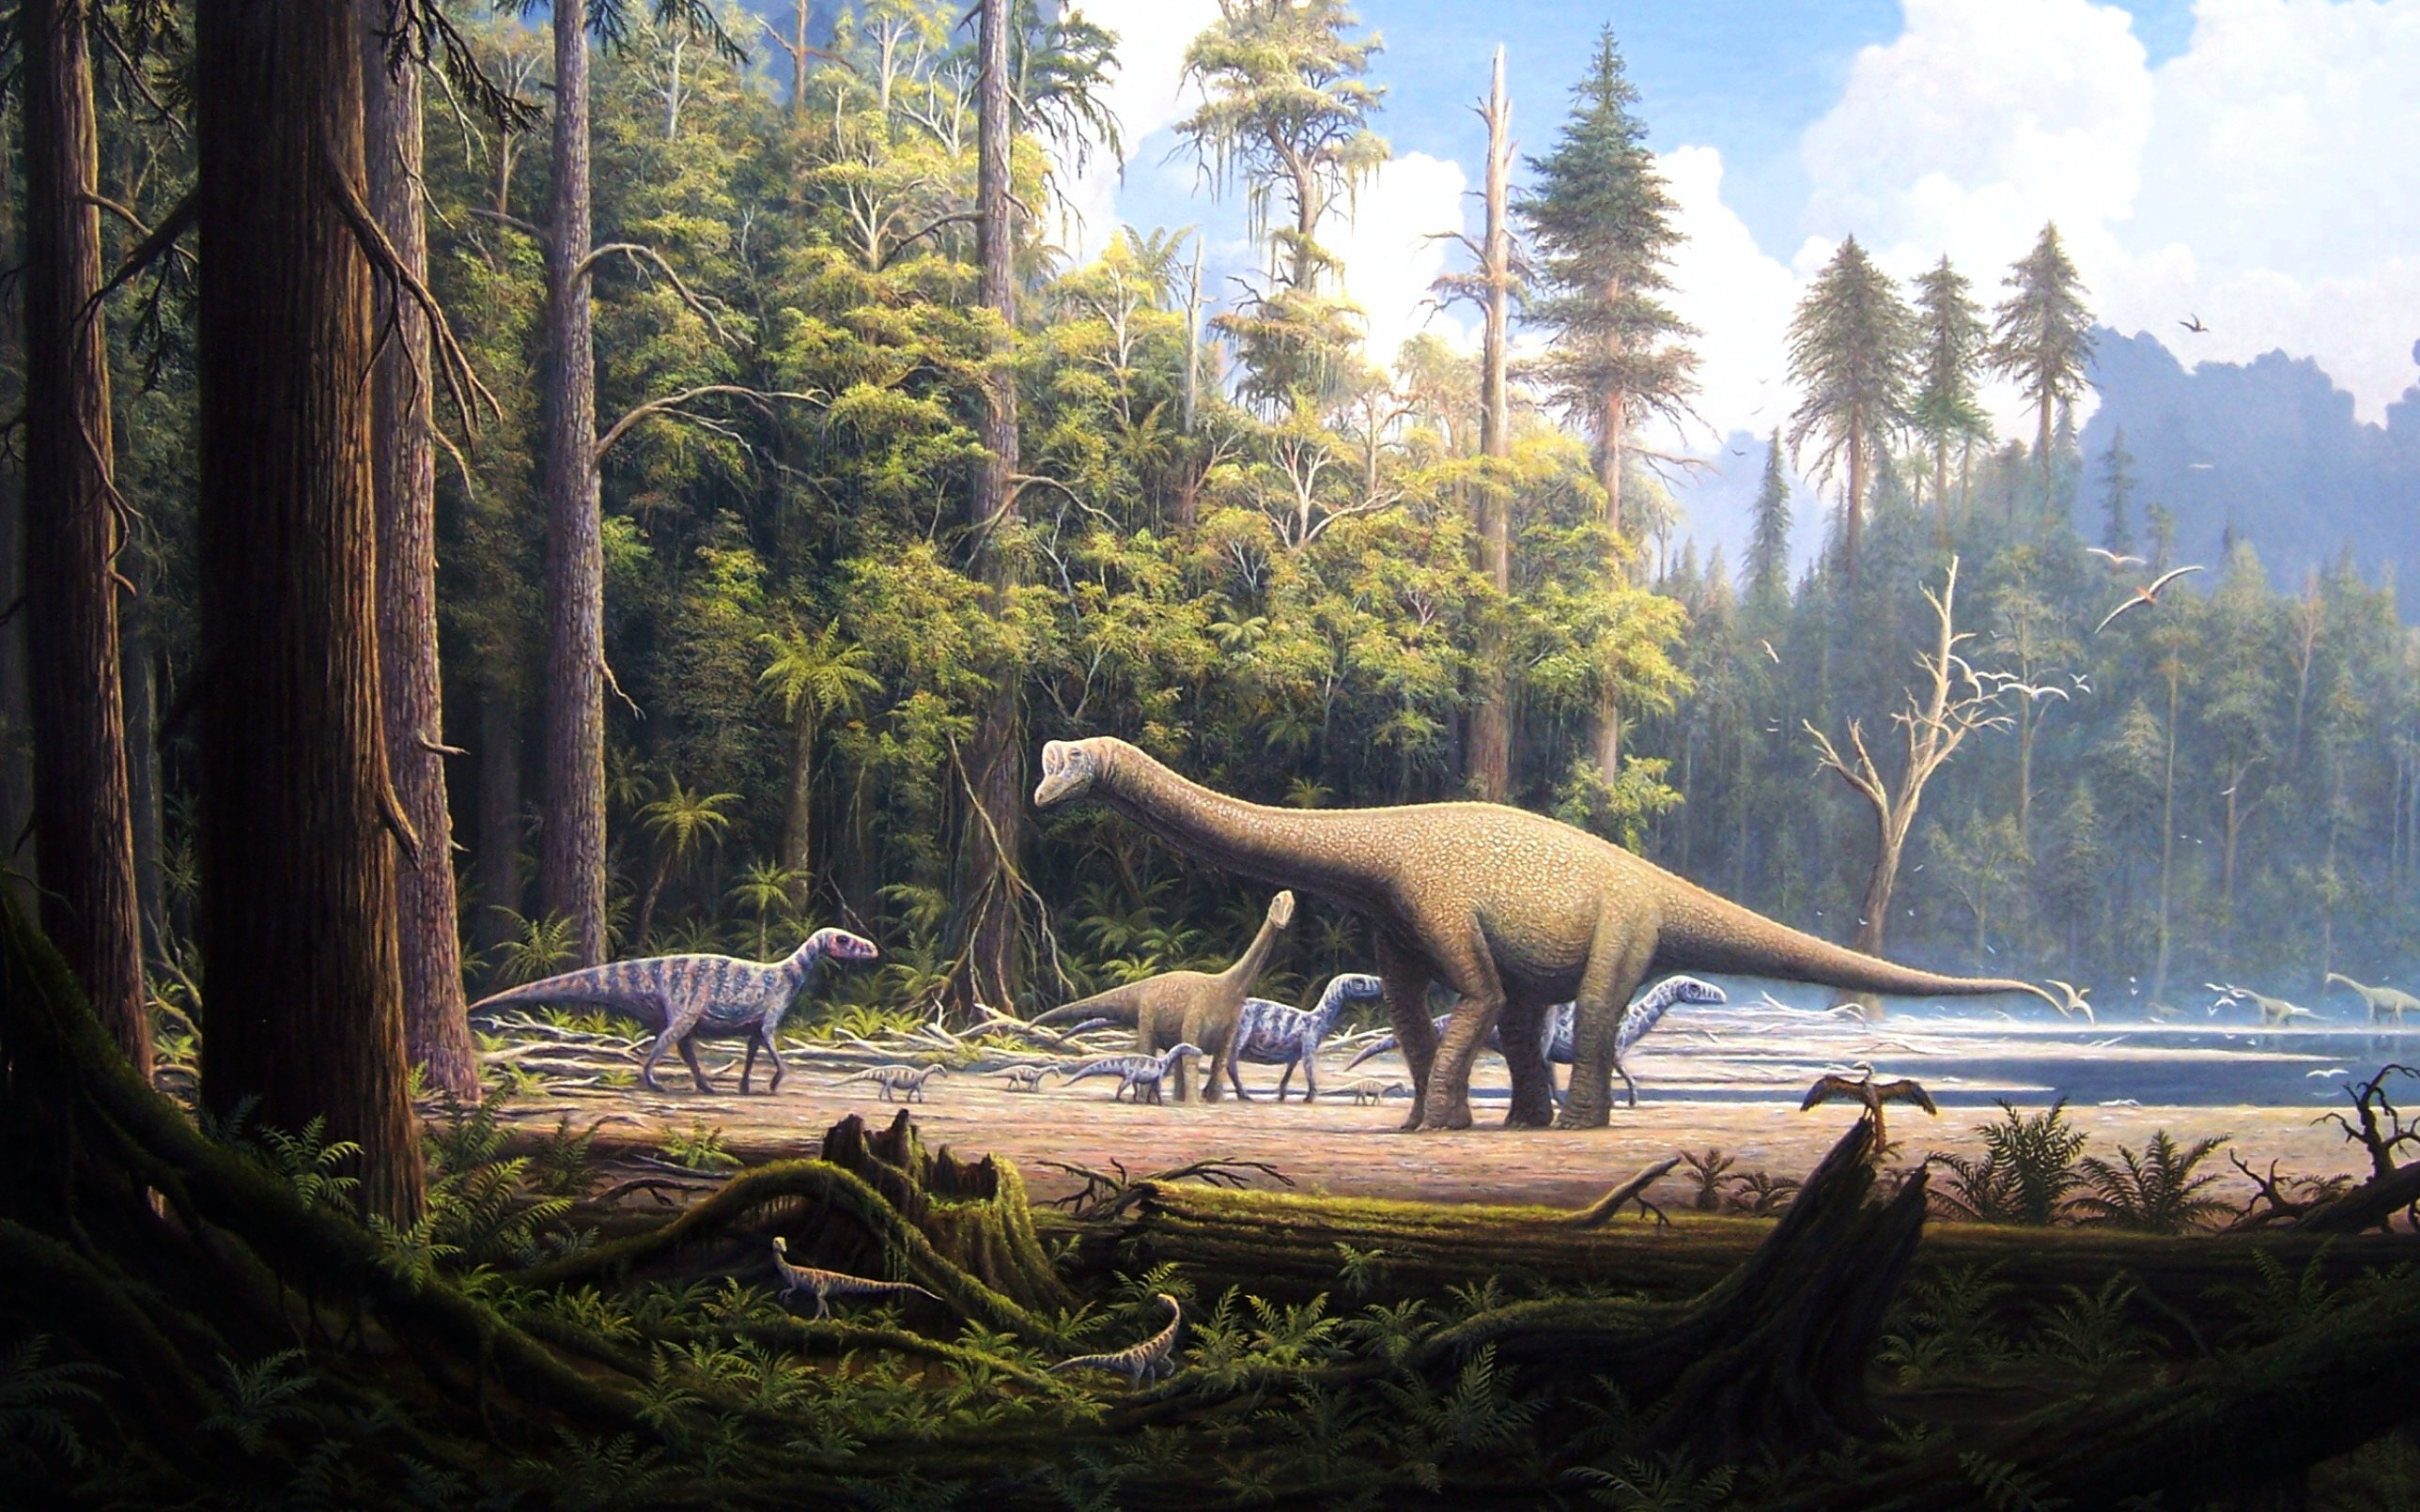 dinosaur landscape background - photo #22